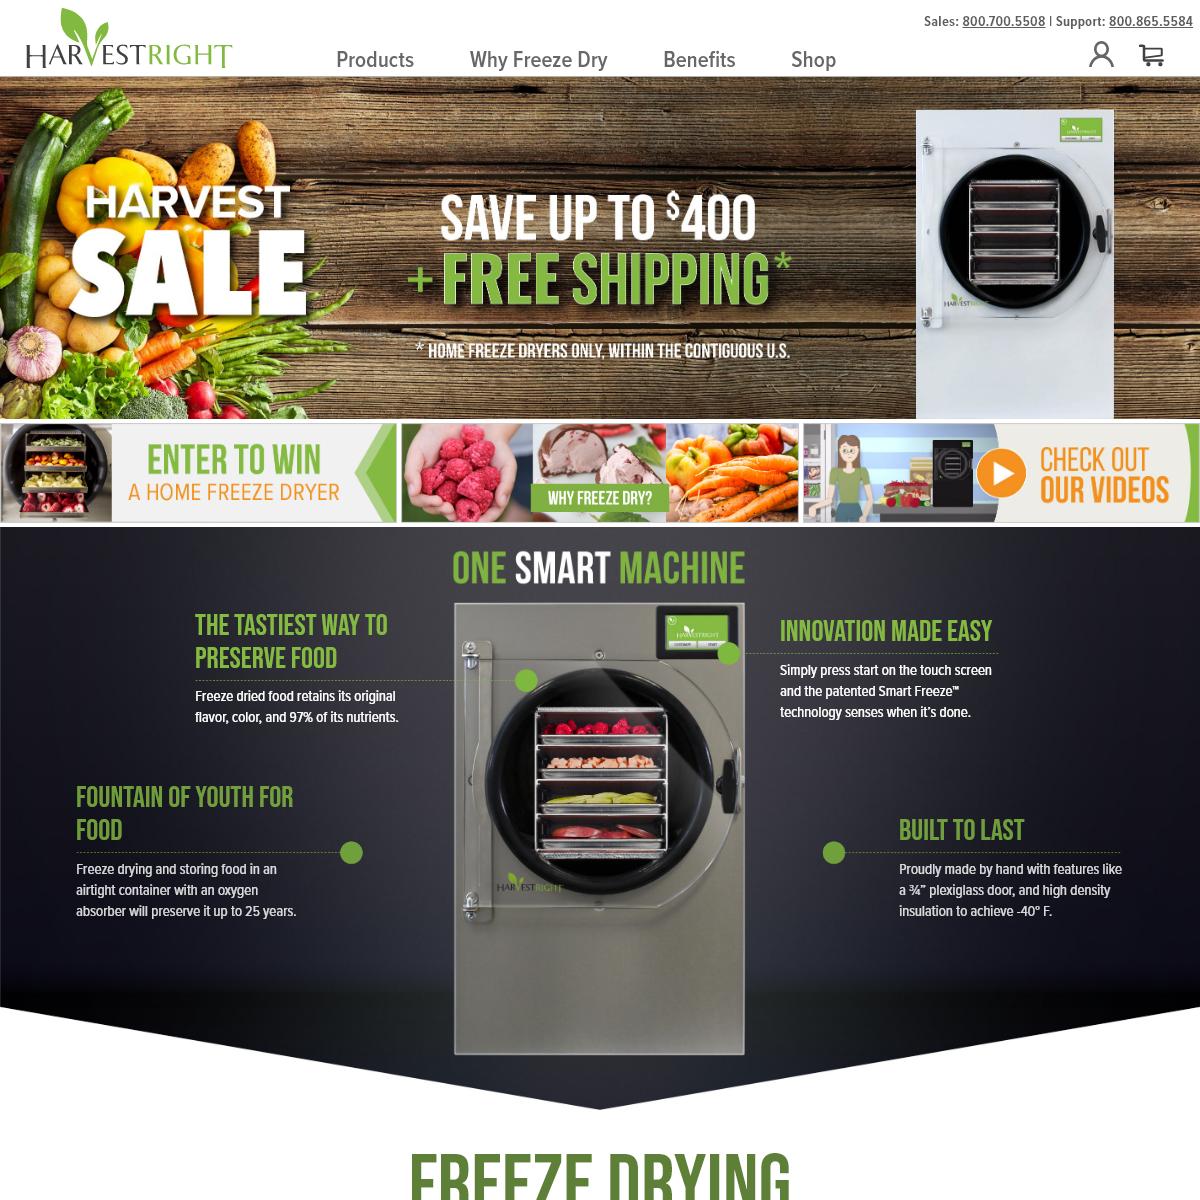 Harvest Right - Freeze Dryers - Freeze Dried Food Storage